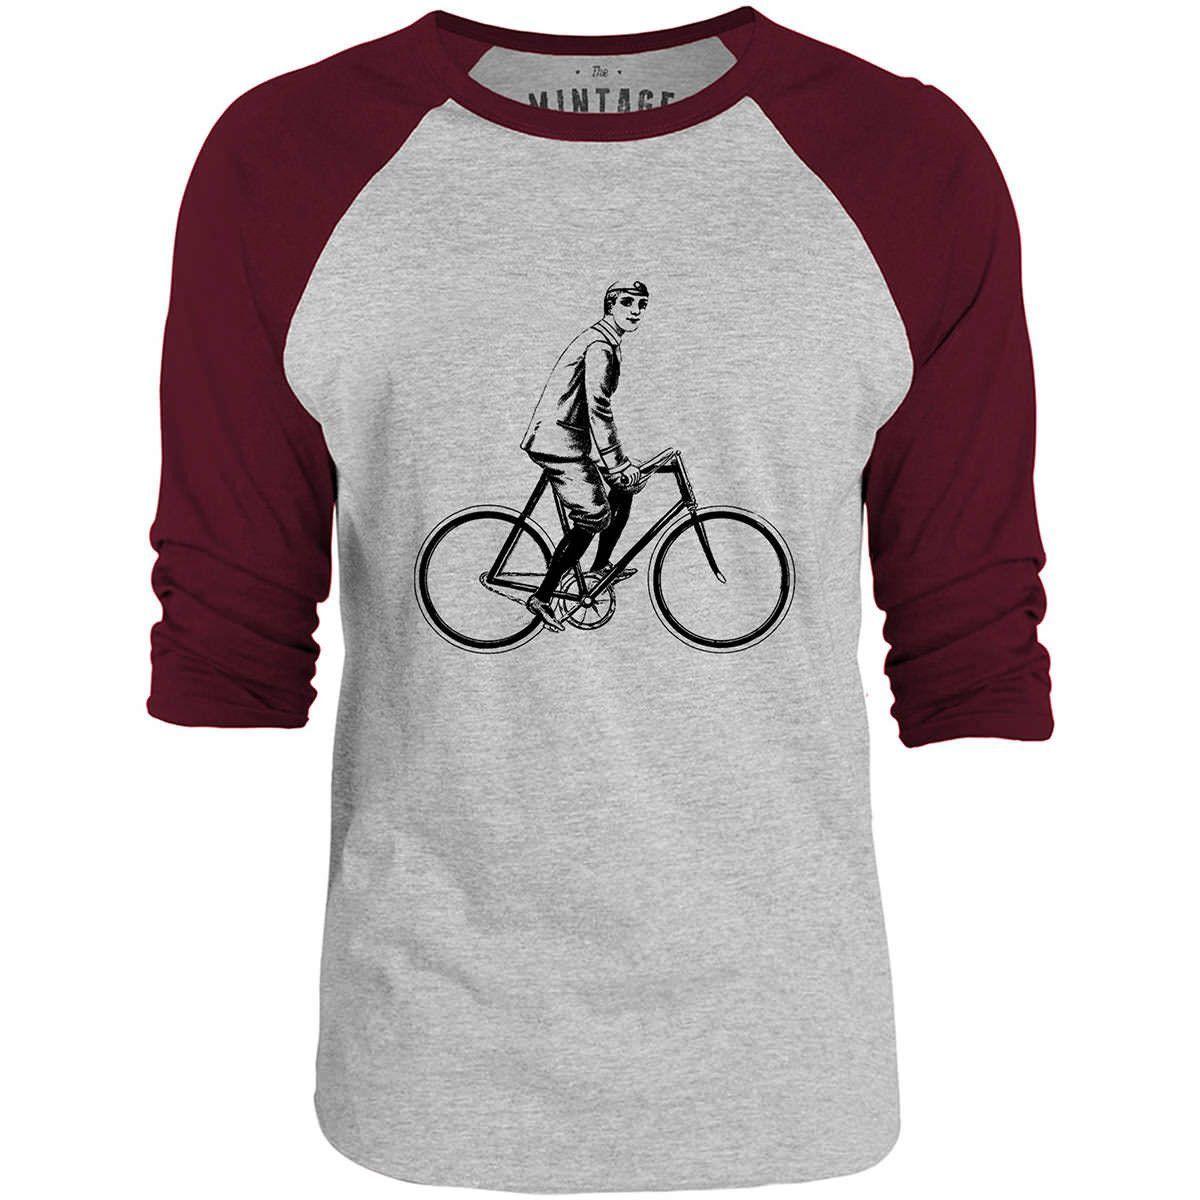 Mintage Vintage Bicycle Boy 3/4-Sleeve Raglan Baseball T-Shirt (Grey Marle / Bordeaux)